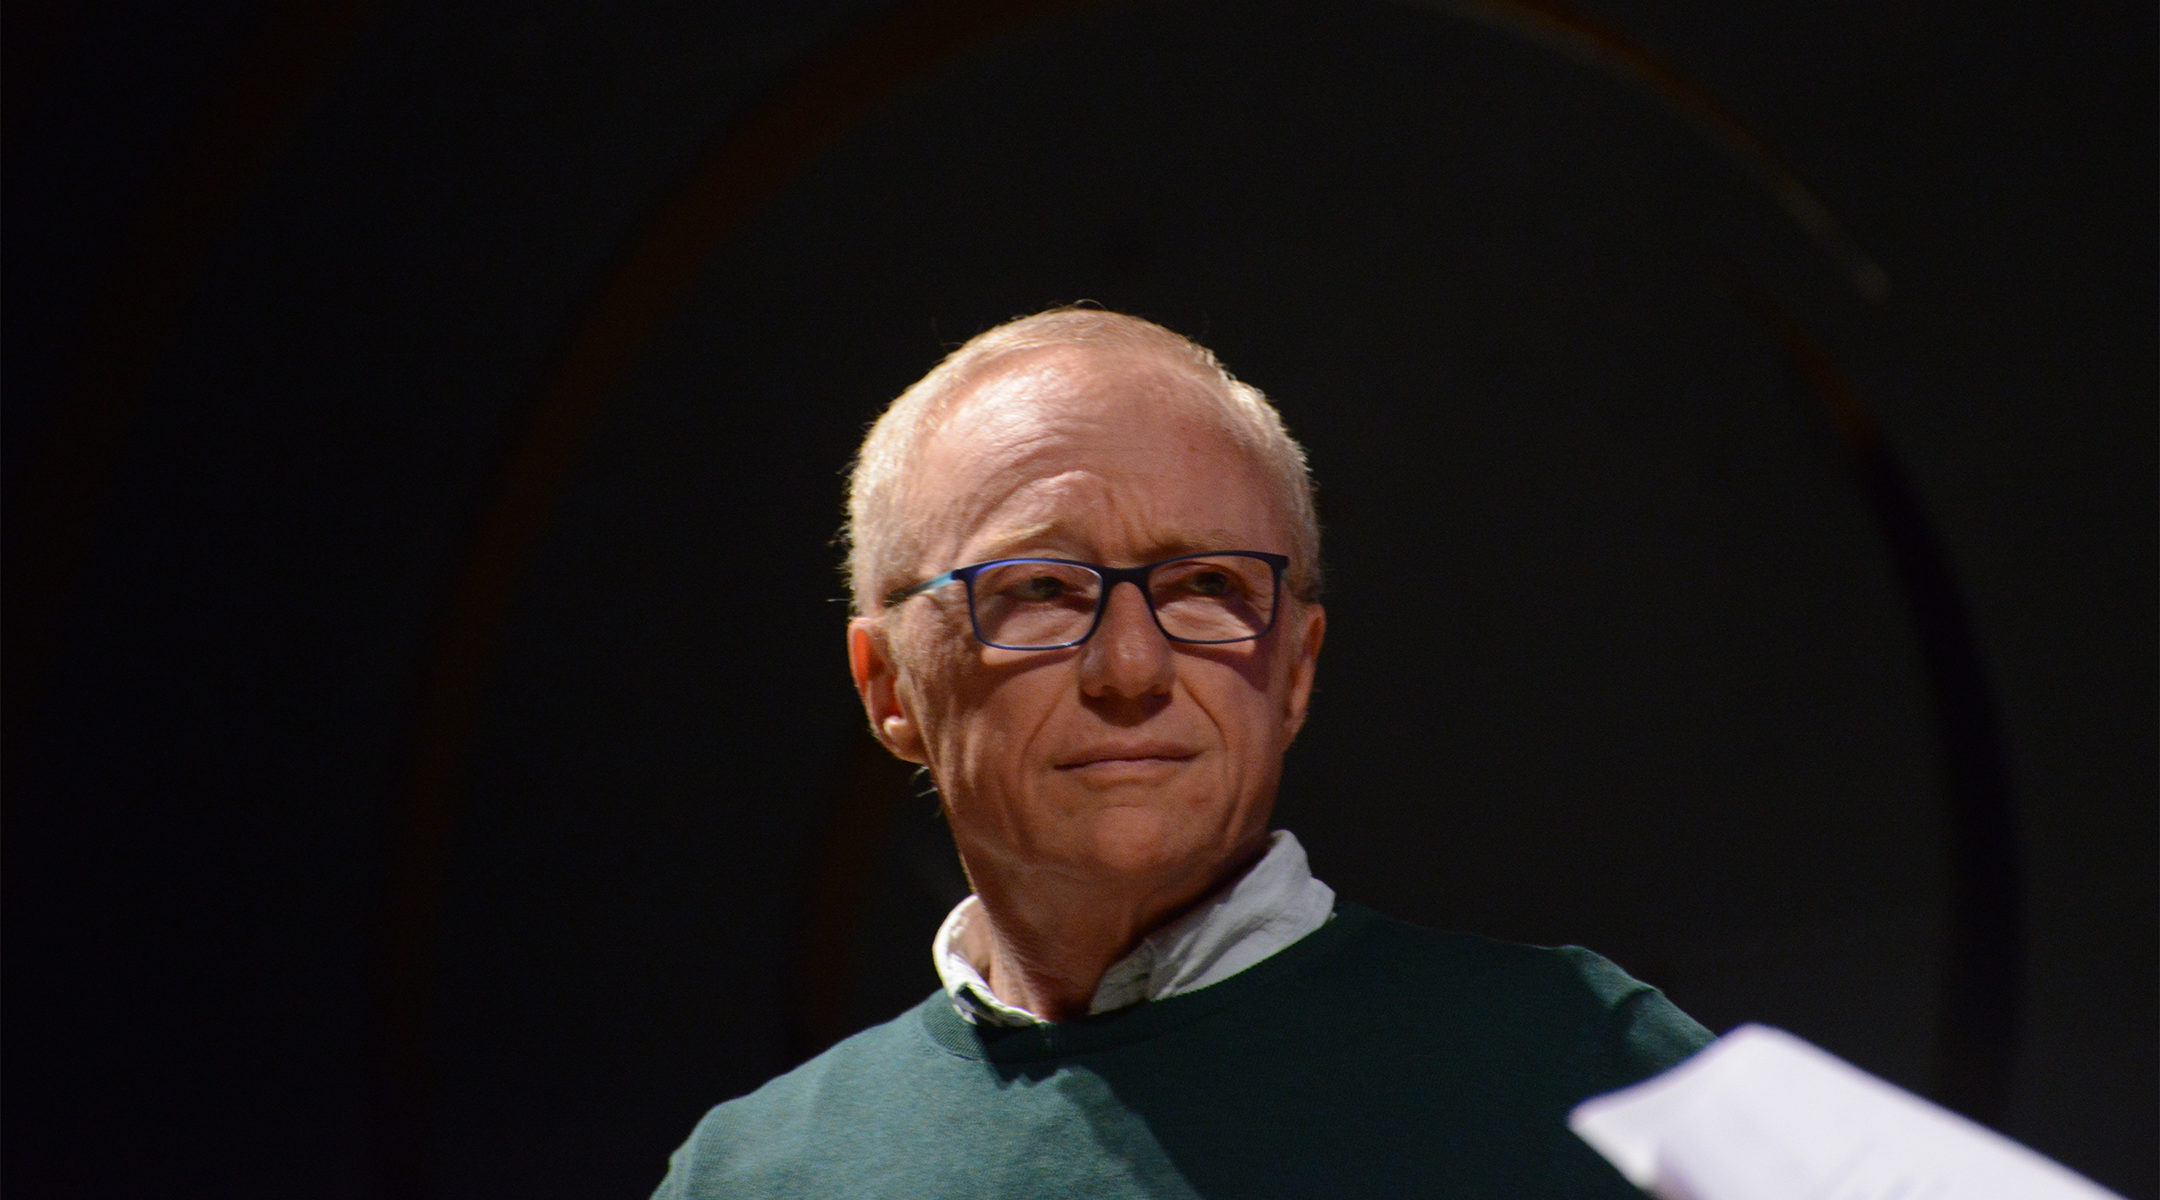 David Grossman at a speaking event at Porto Alegre, Brazil on Oct. 30, 2016 (Fronteiras do Pensamento/Luiz Munhoz/Wikemedia Commons)